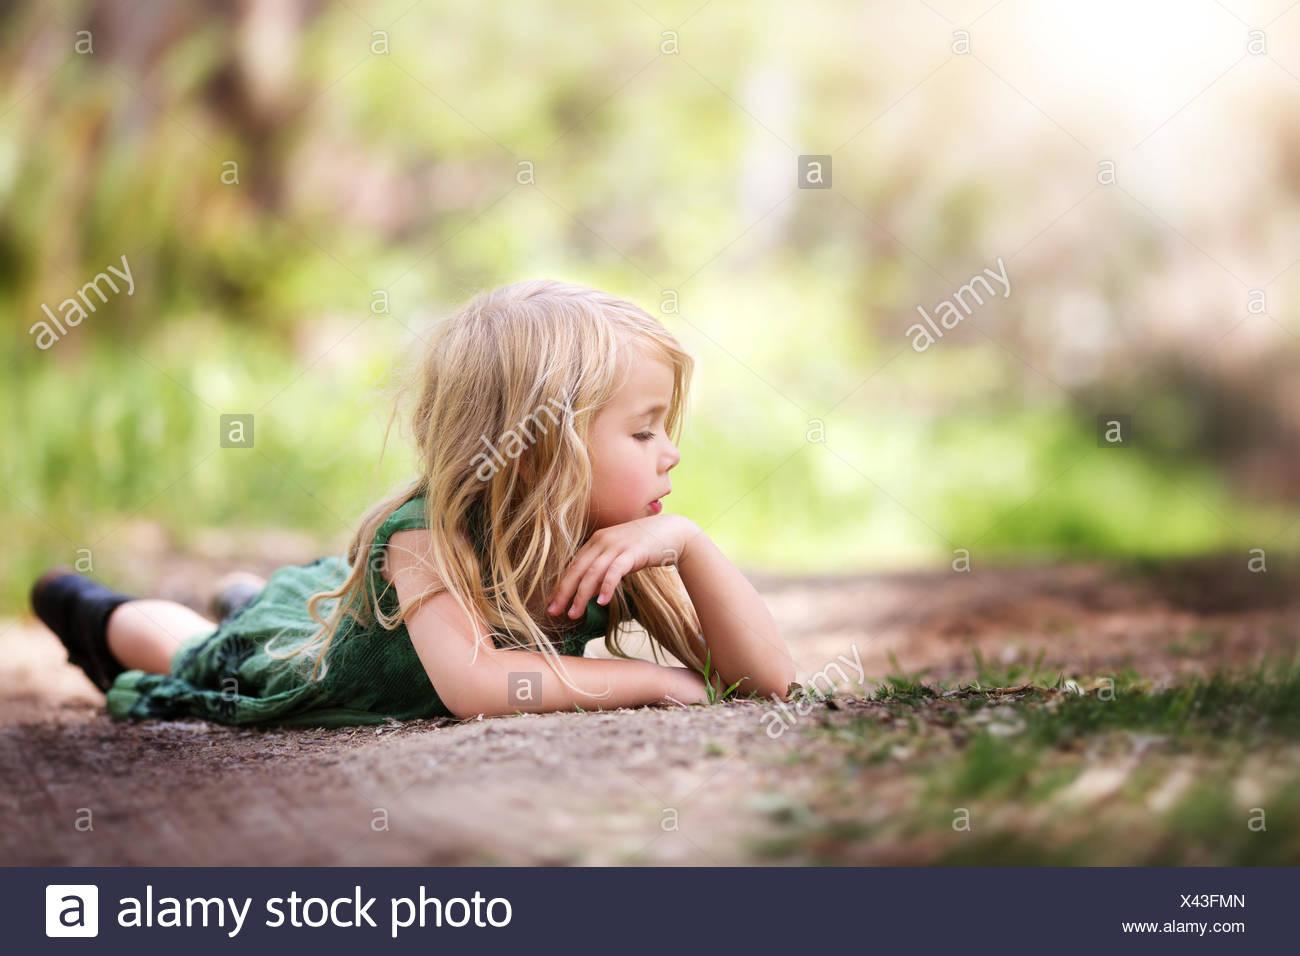 Girl (4-5) on path - Stock Image